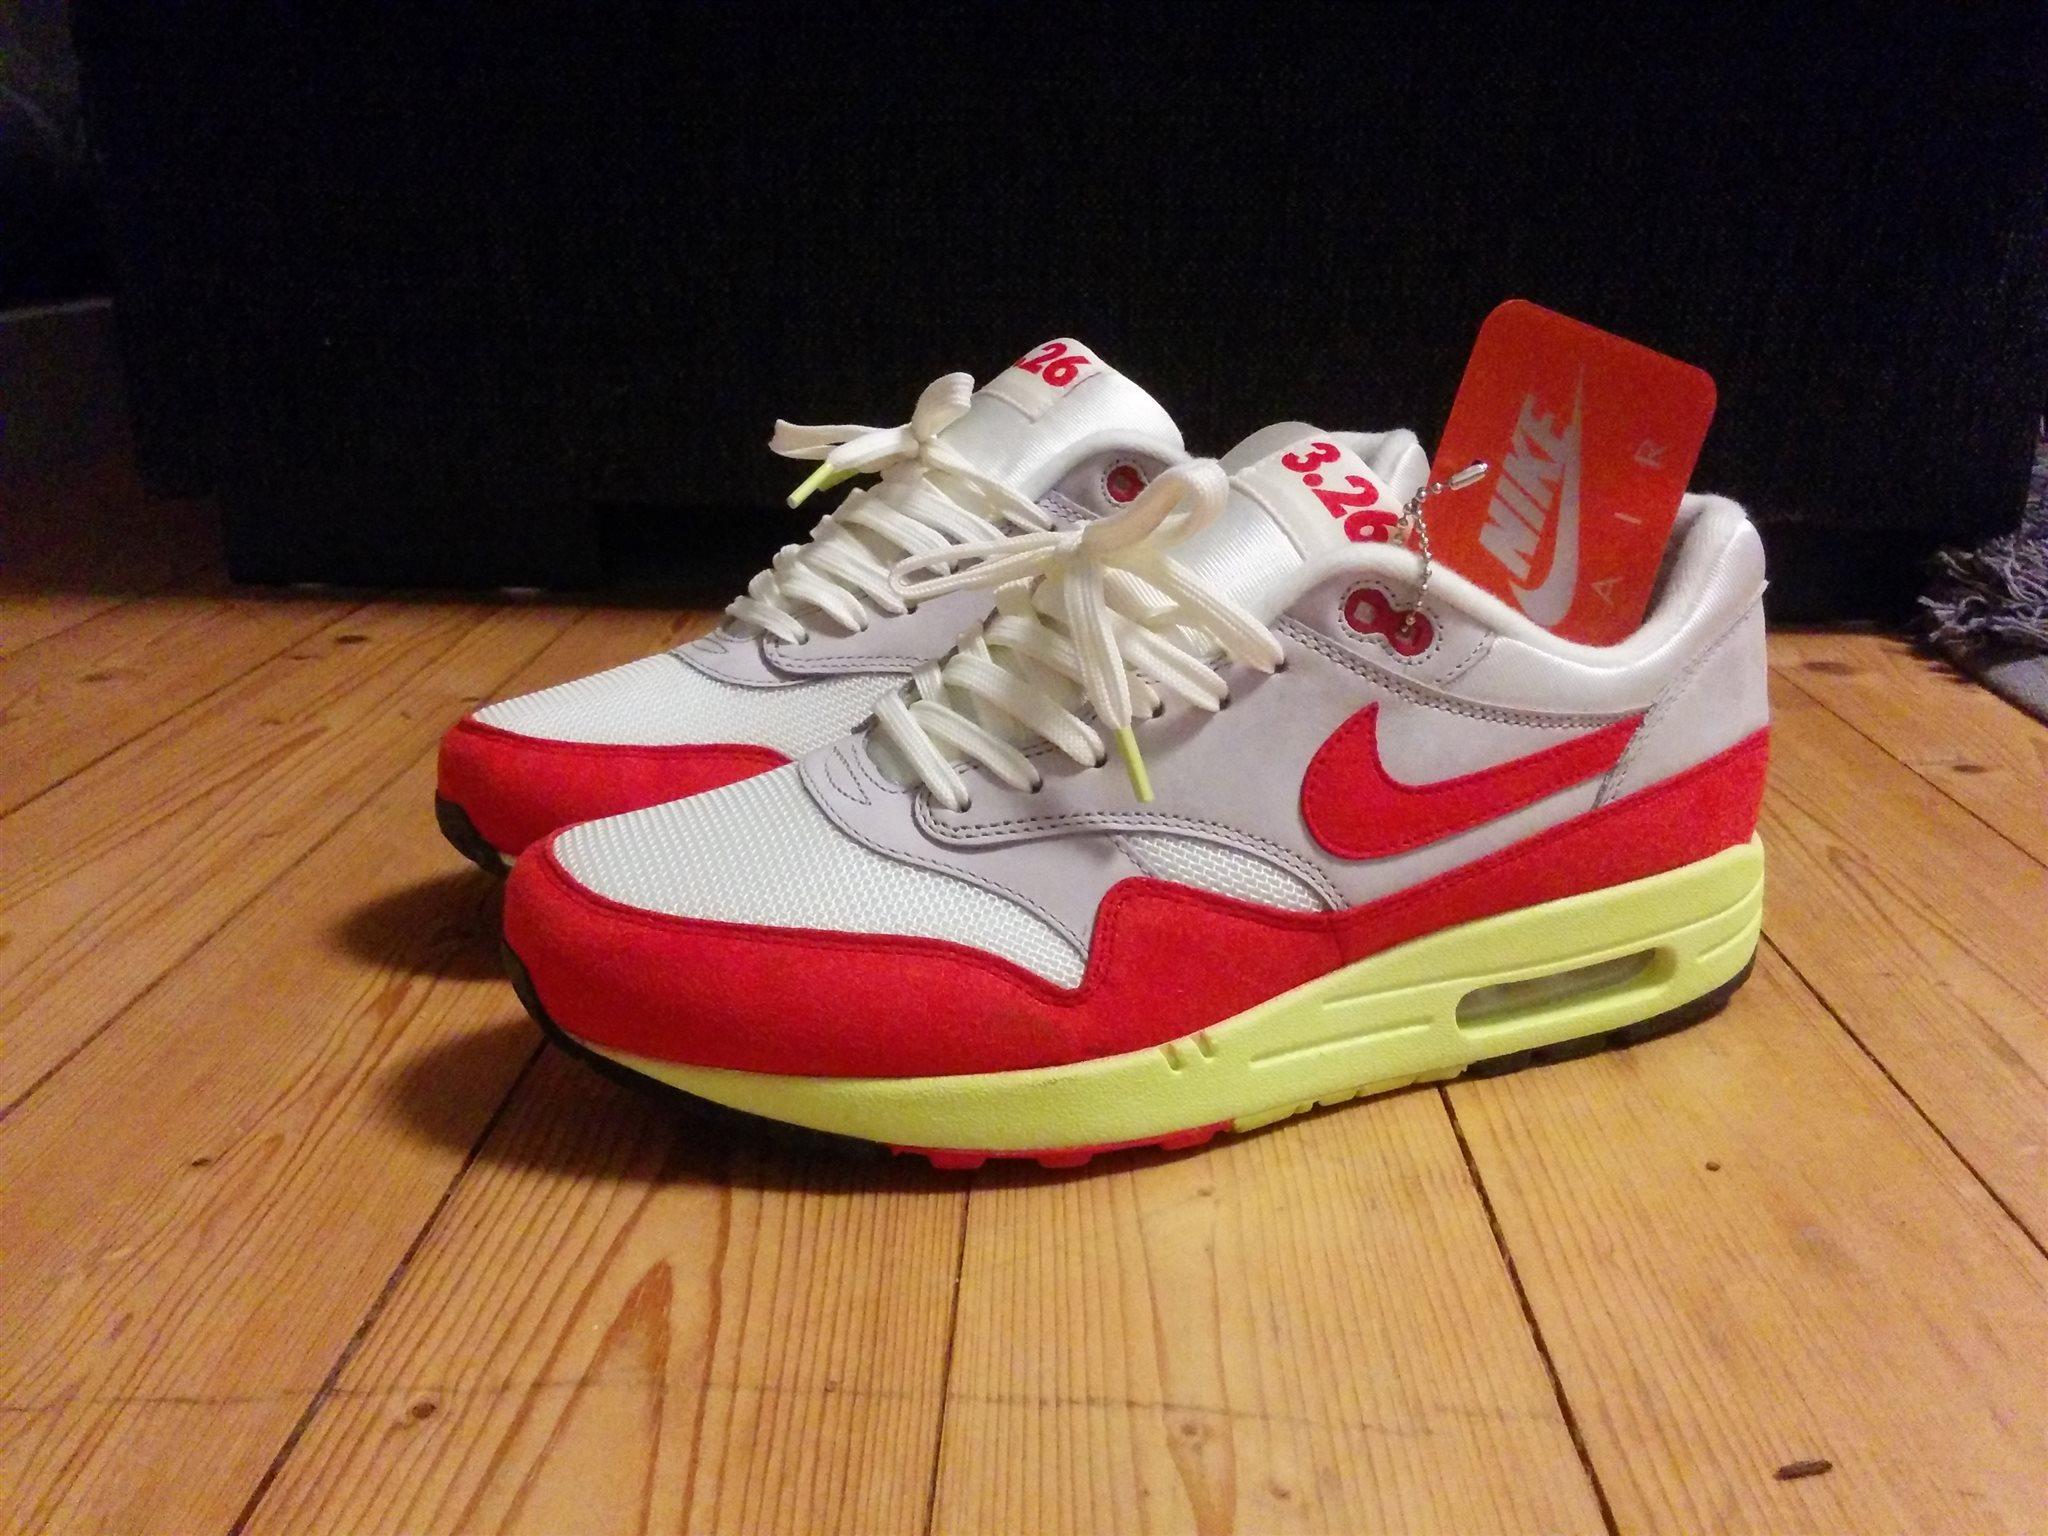 competitive price 5404b 36515 Nike Air Max 1